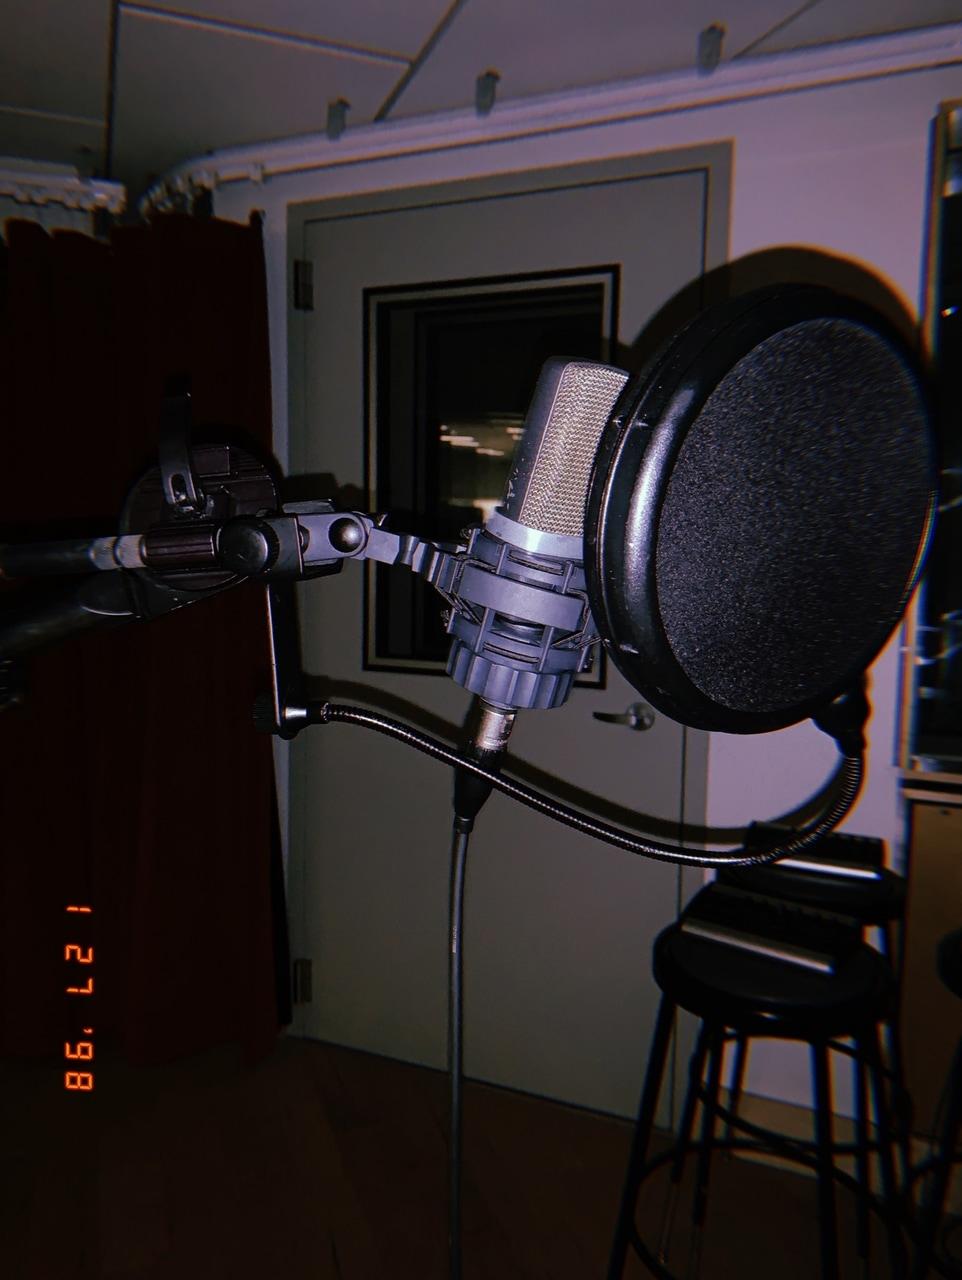 album, arena, and career image